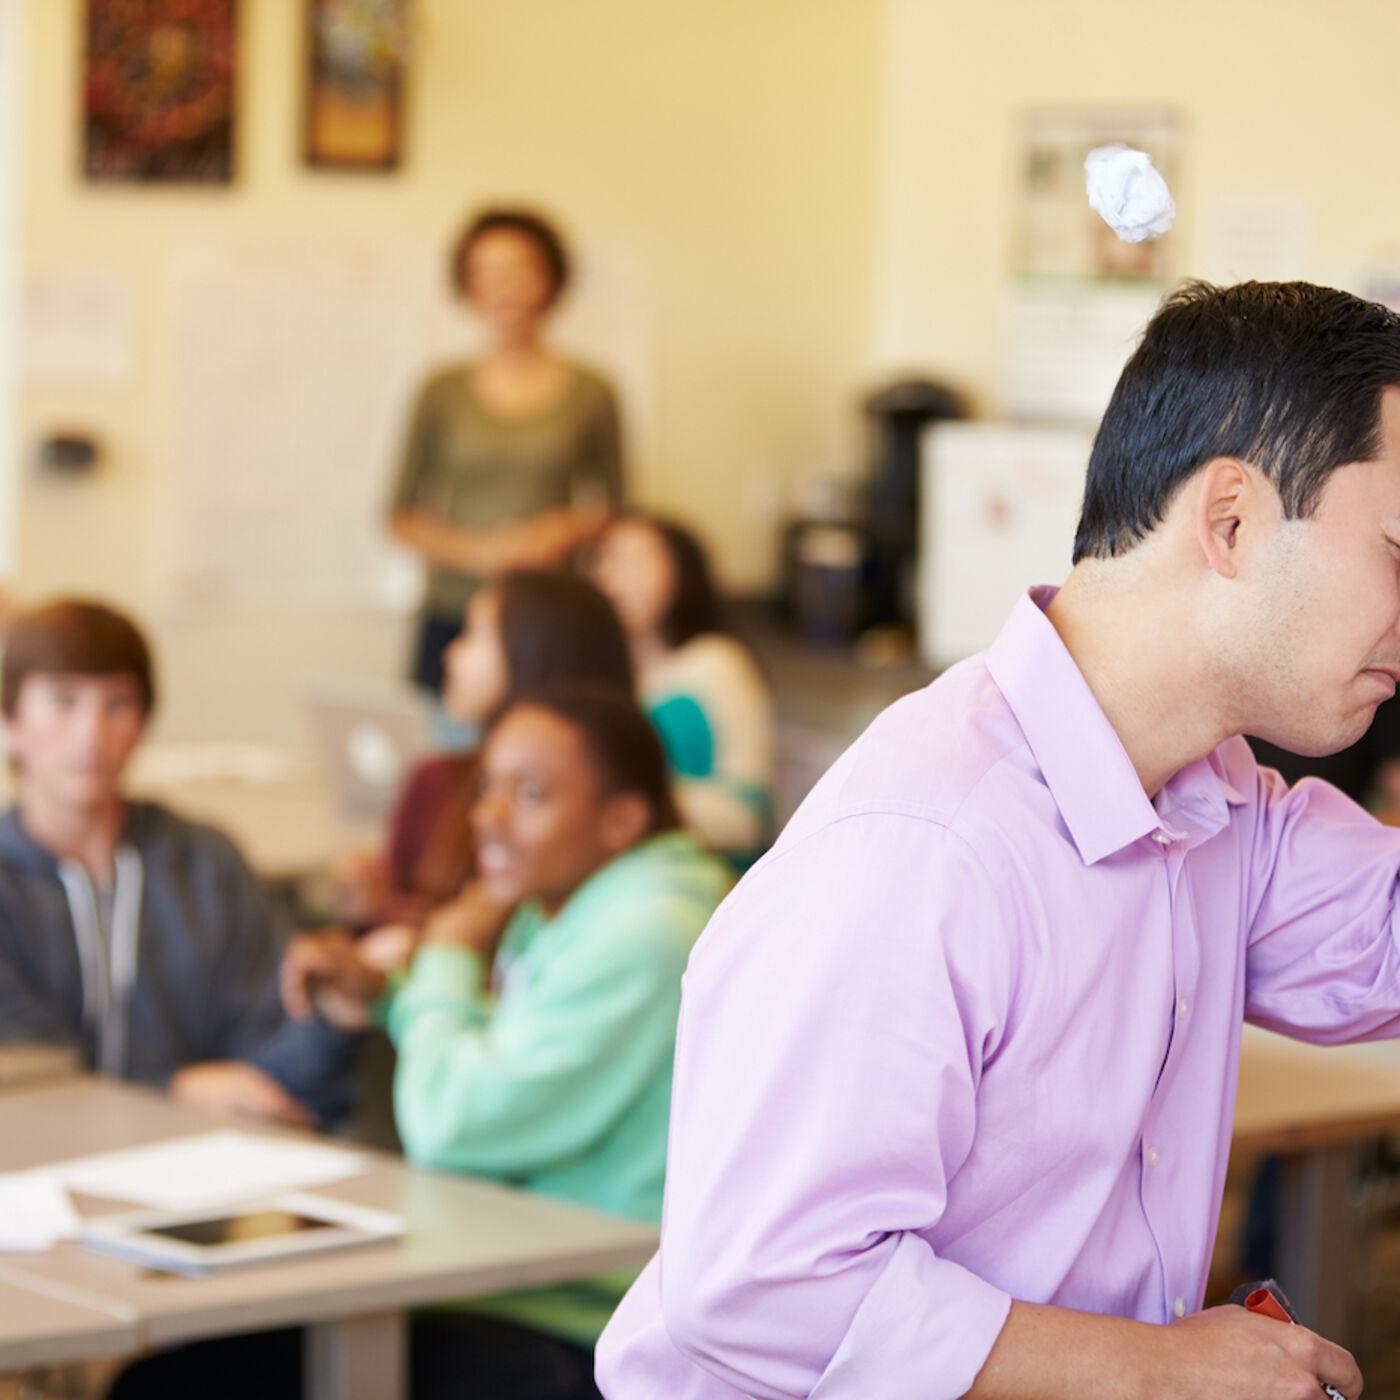 The Anxiety Epidemic & Teacher Burnout